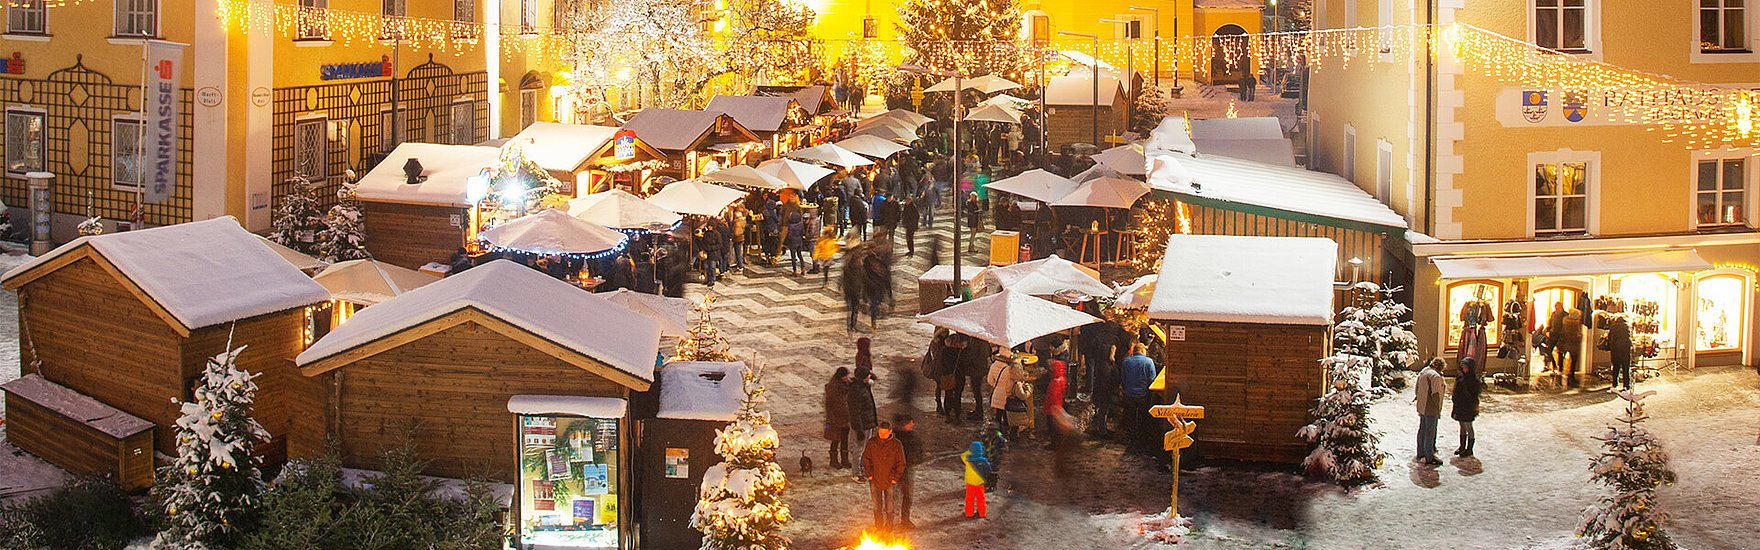 Adventmarkt Mondsee (c) TVB MondSeeLand, Wolfgang Weinhäupl